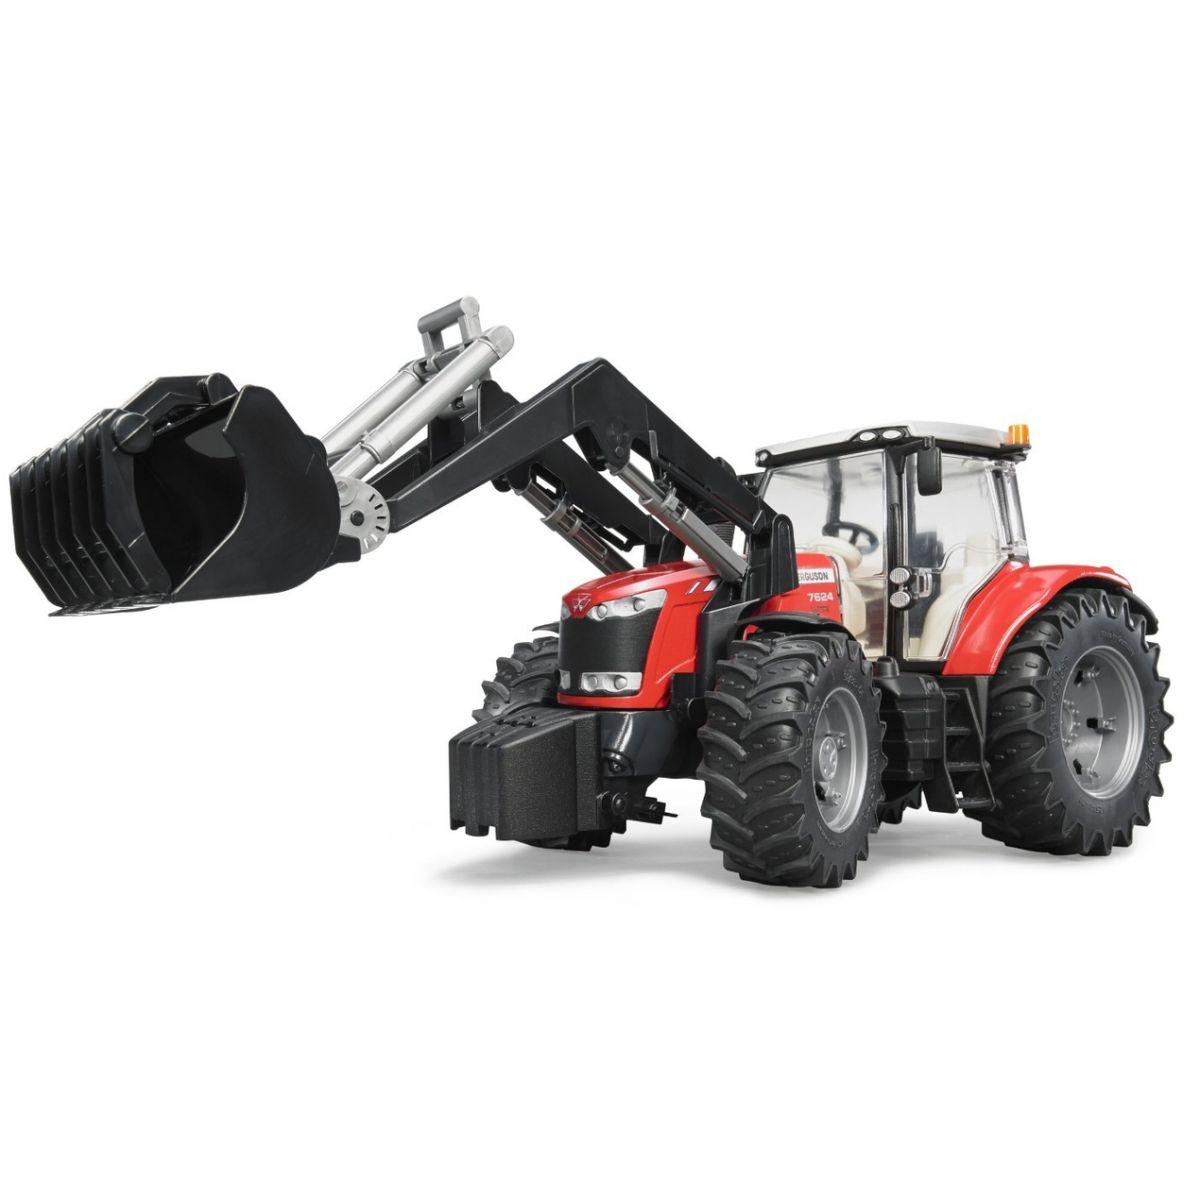 Bruder 03047 Traktor Massey Ferguson 7624 a čelní nakladač